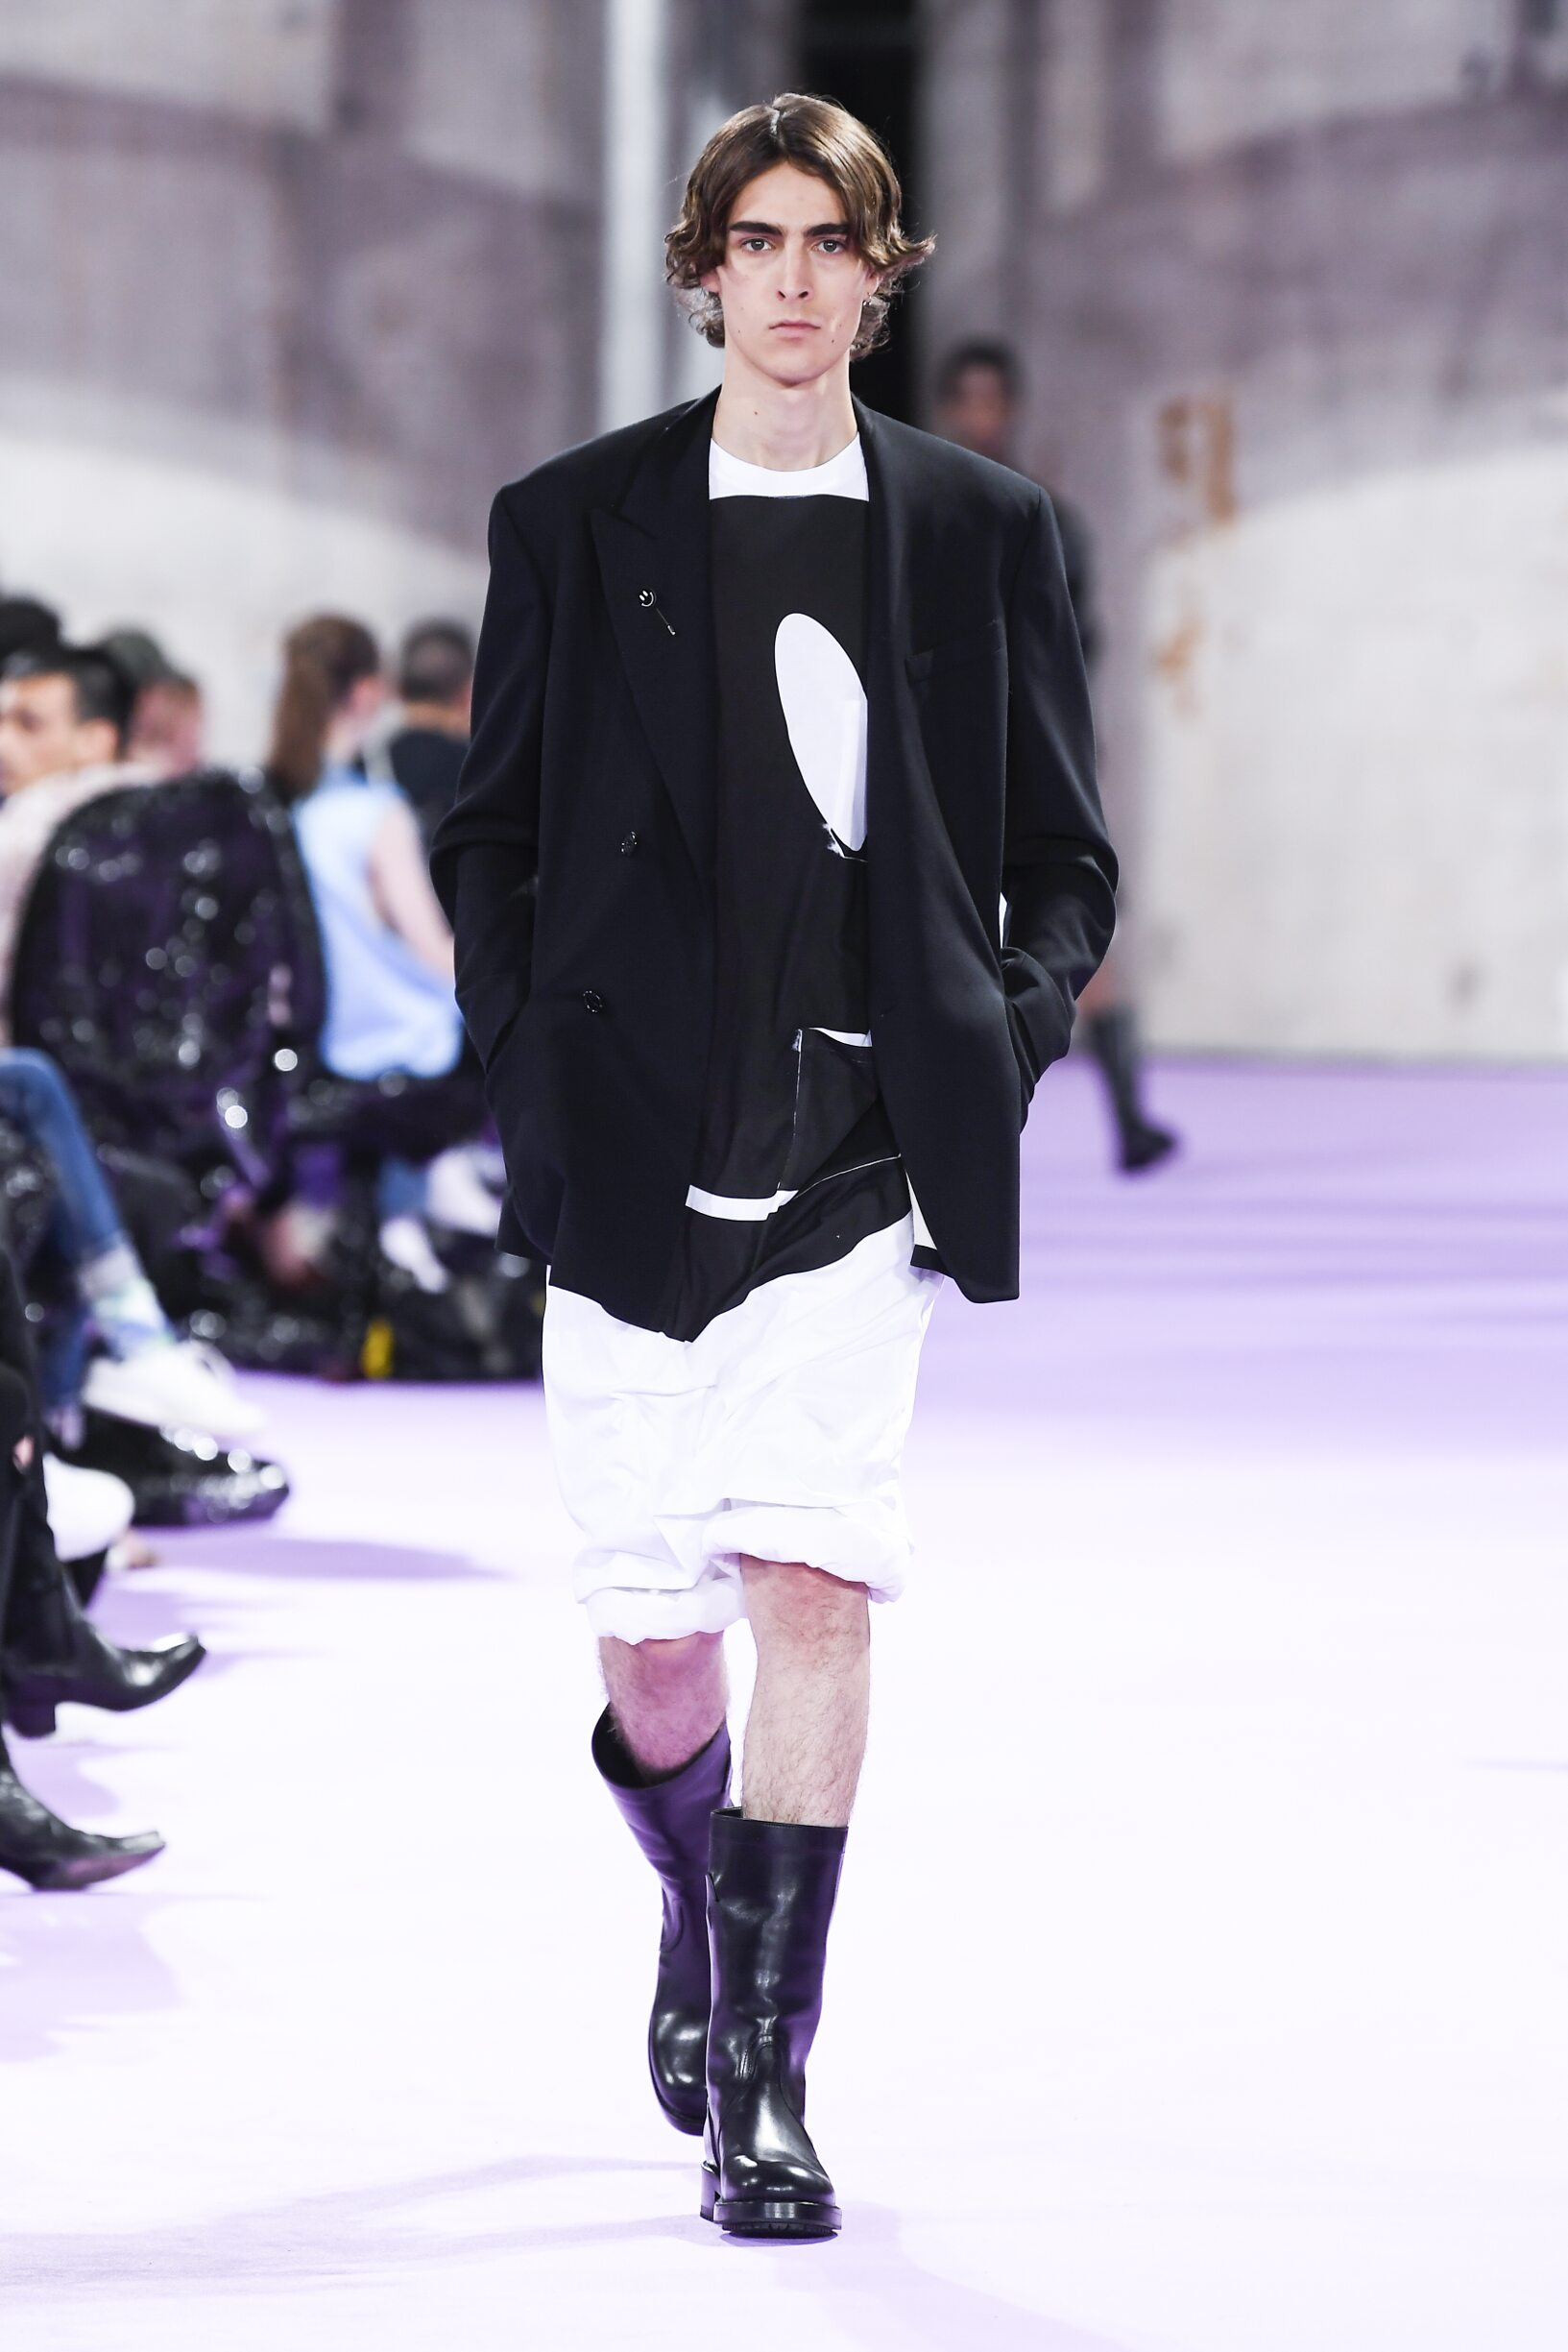 Man SS 2020 Raf Simons Show Paris Fashion Week